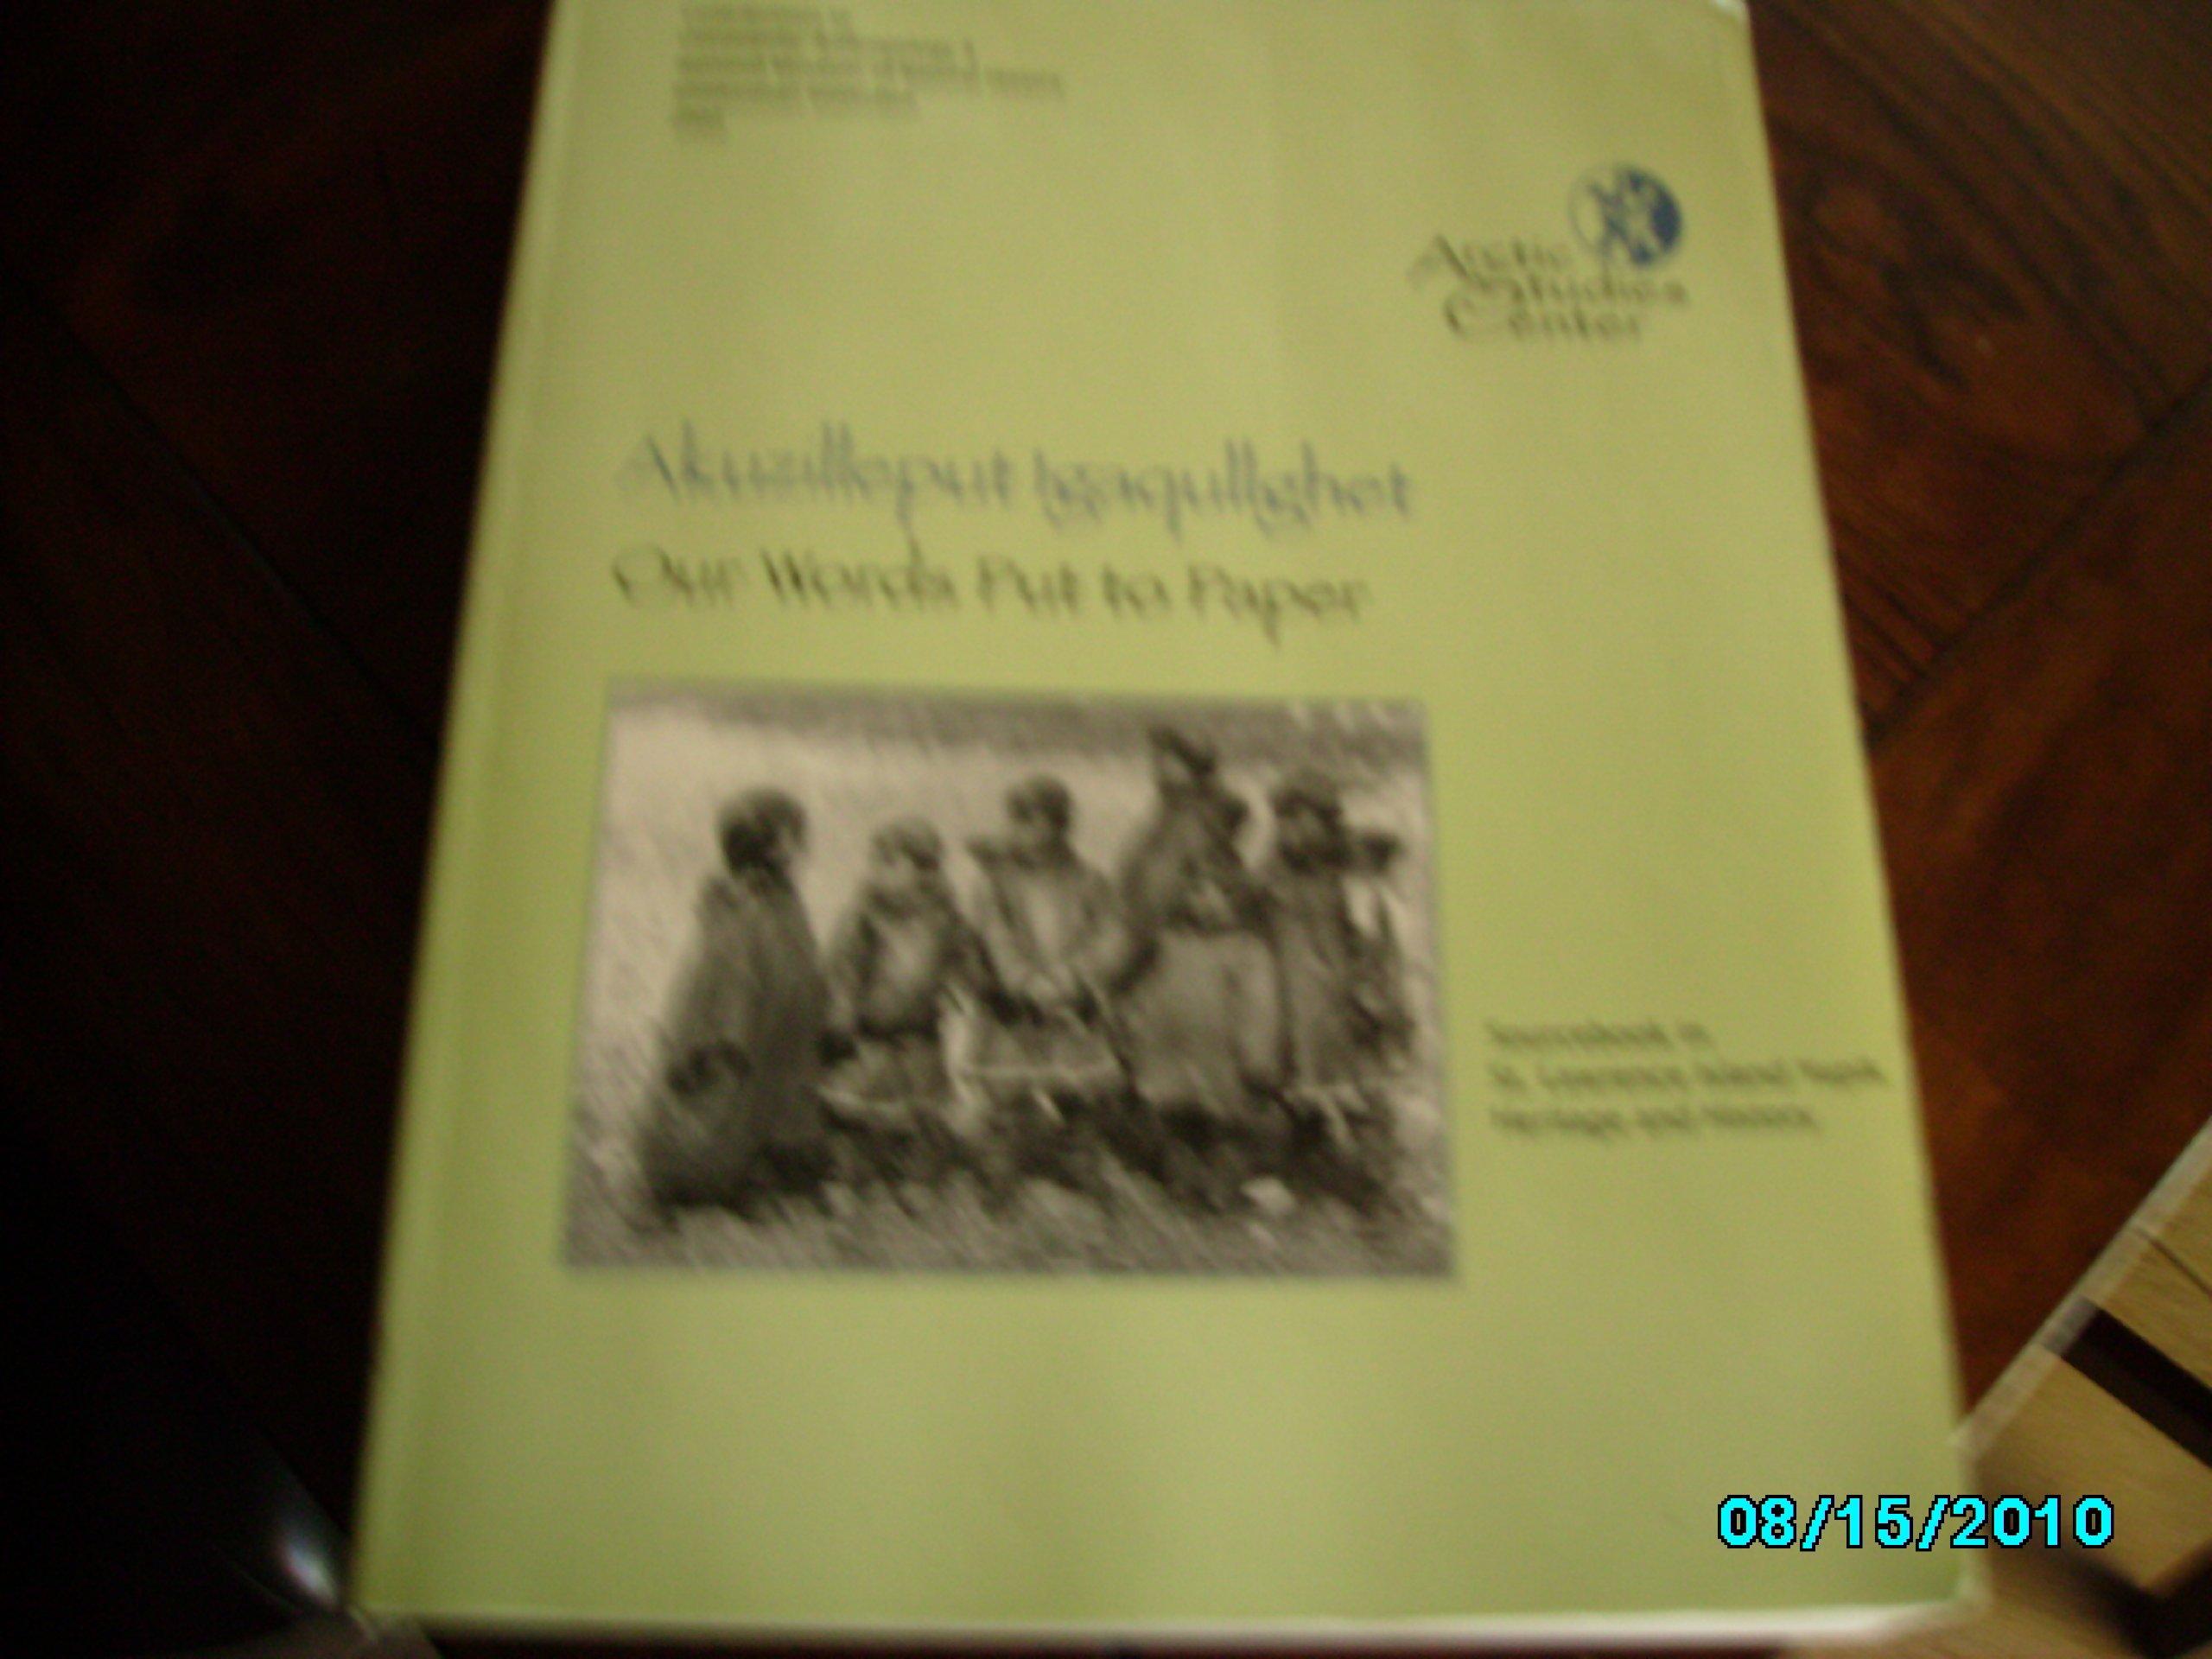 Akuzilleput Igaqullghet. Our Words Put to Paper (Arctic Studies Center, Volume 3) ebook